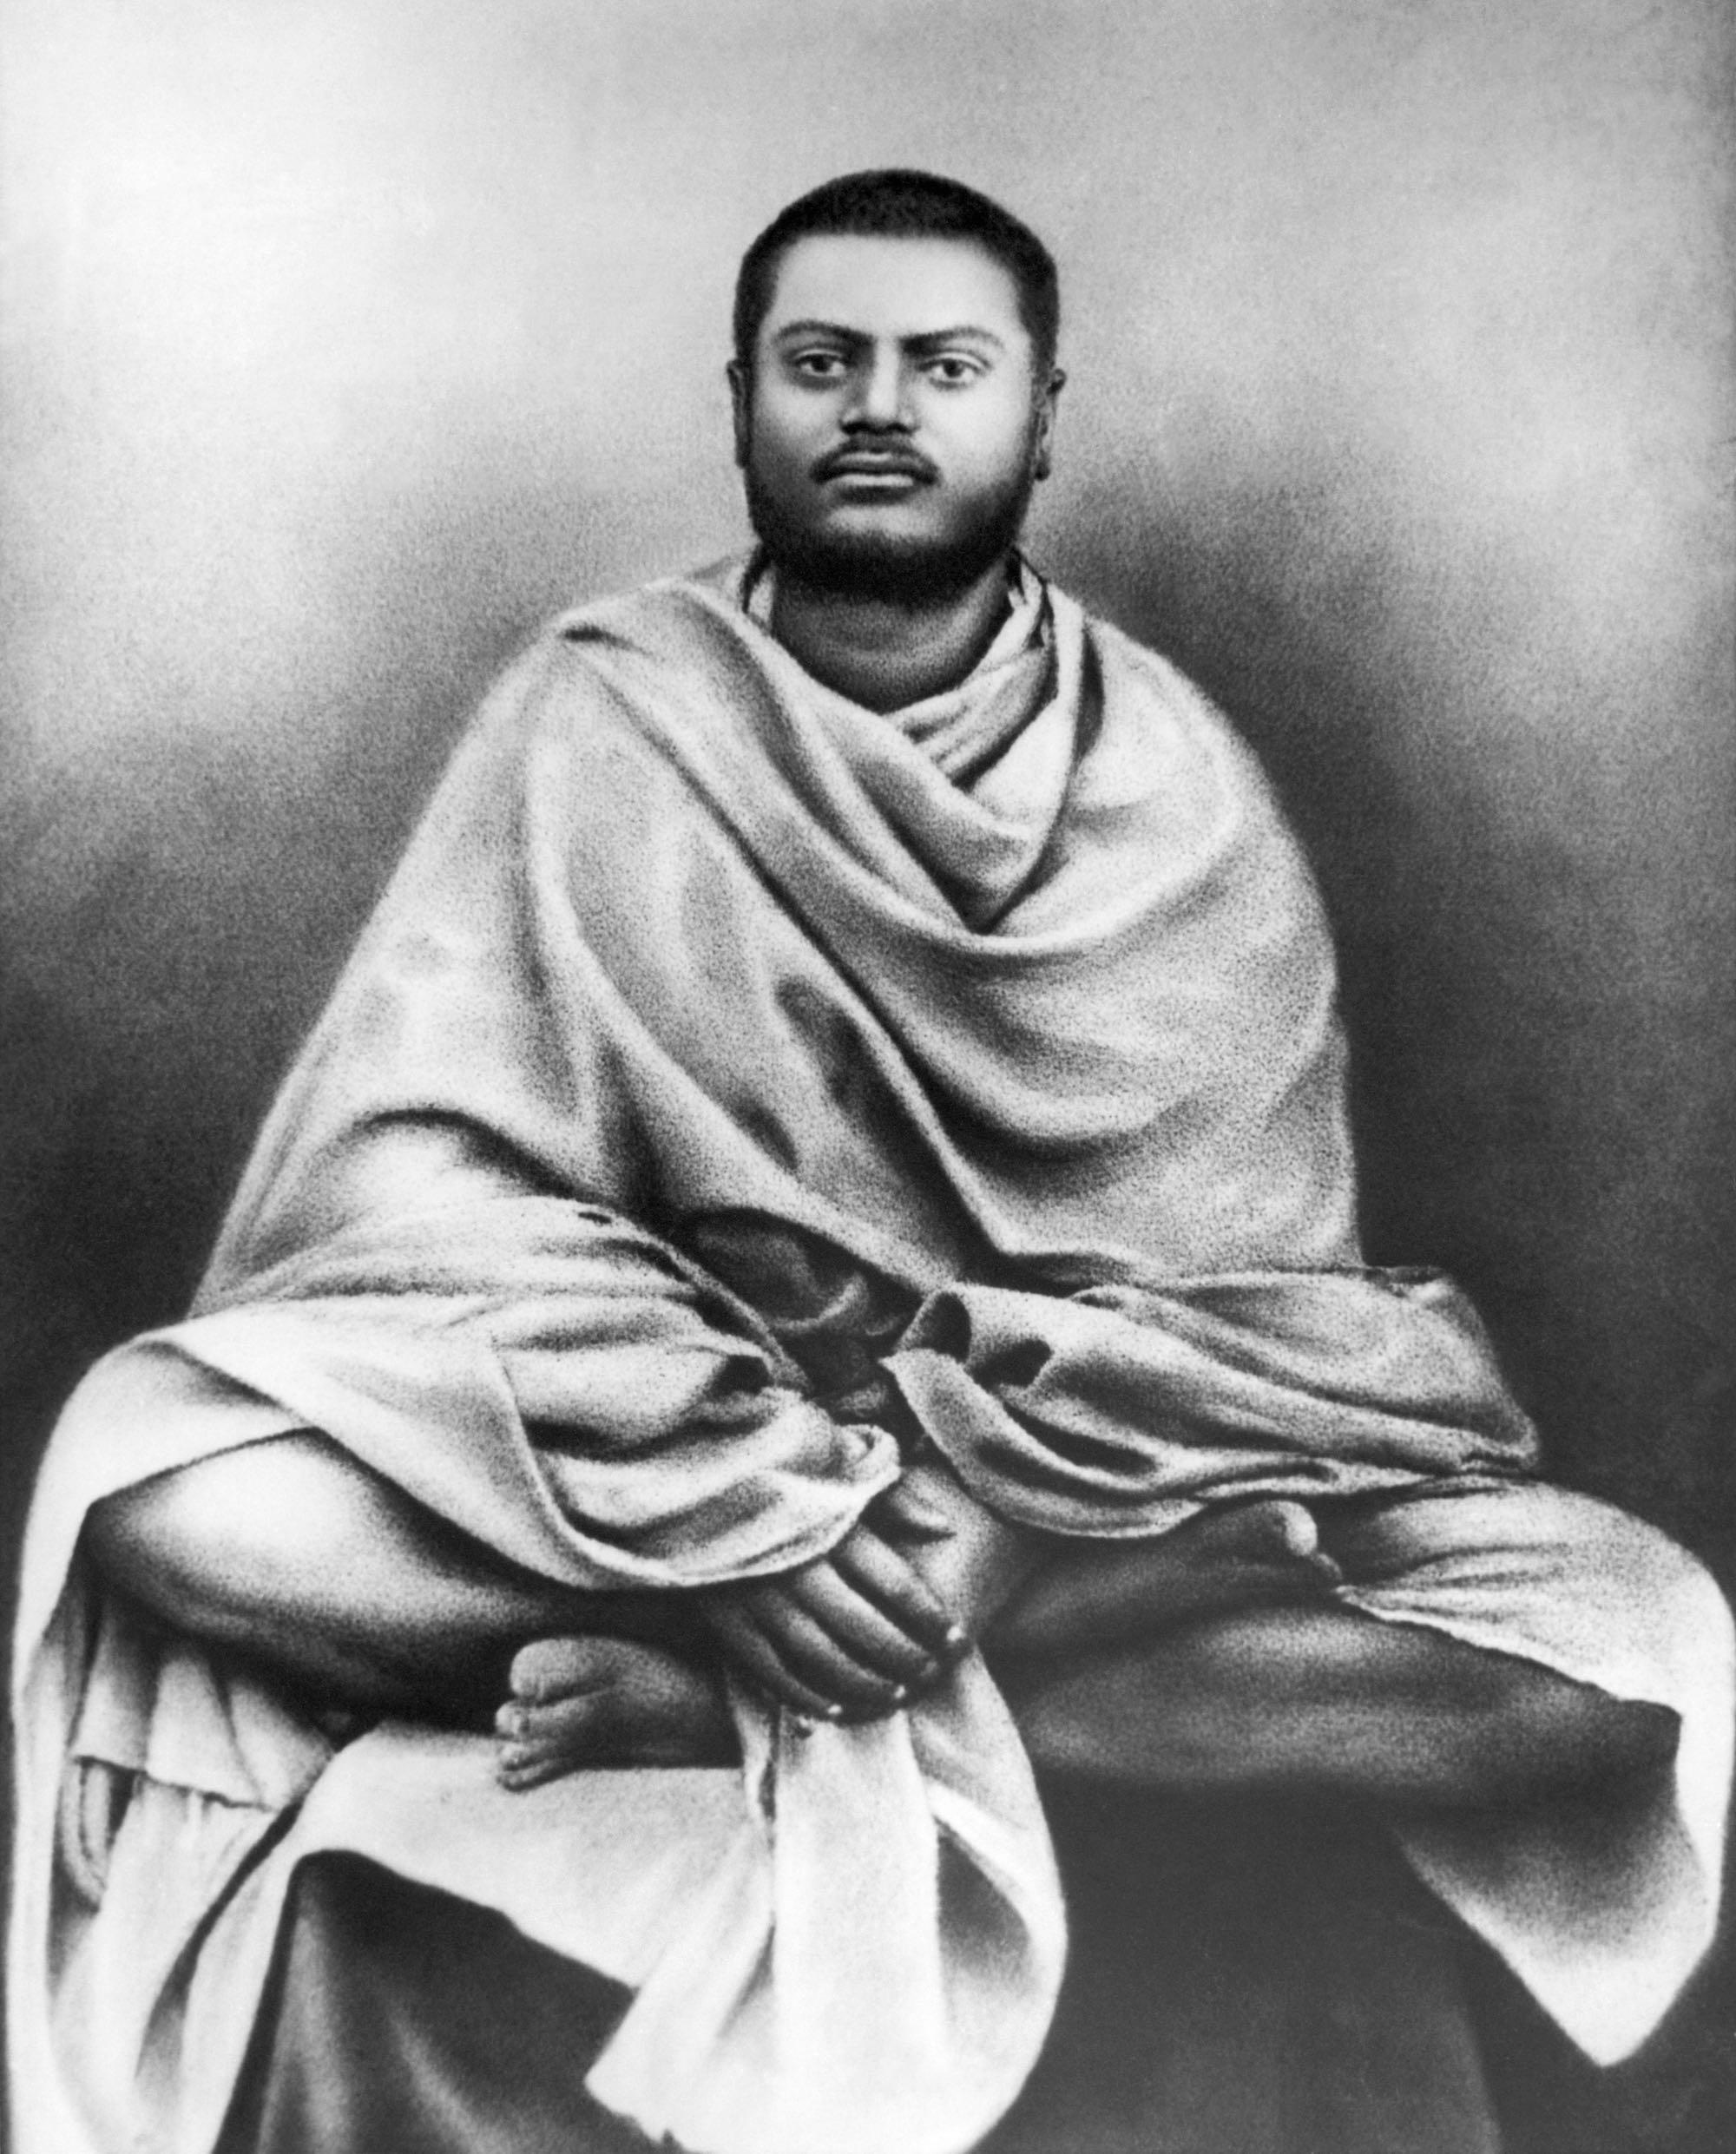 (#2) Kolkata 1886